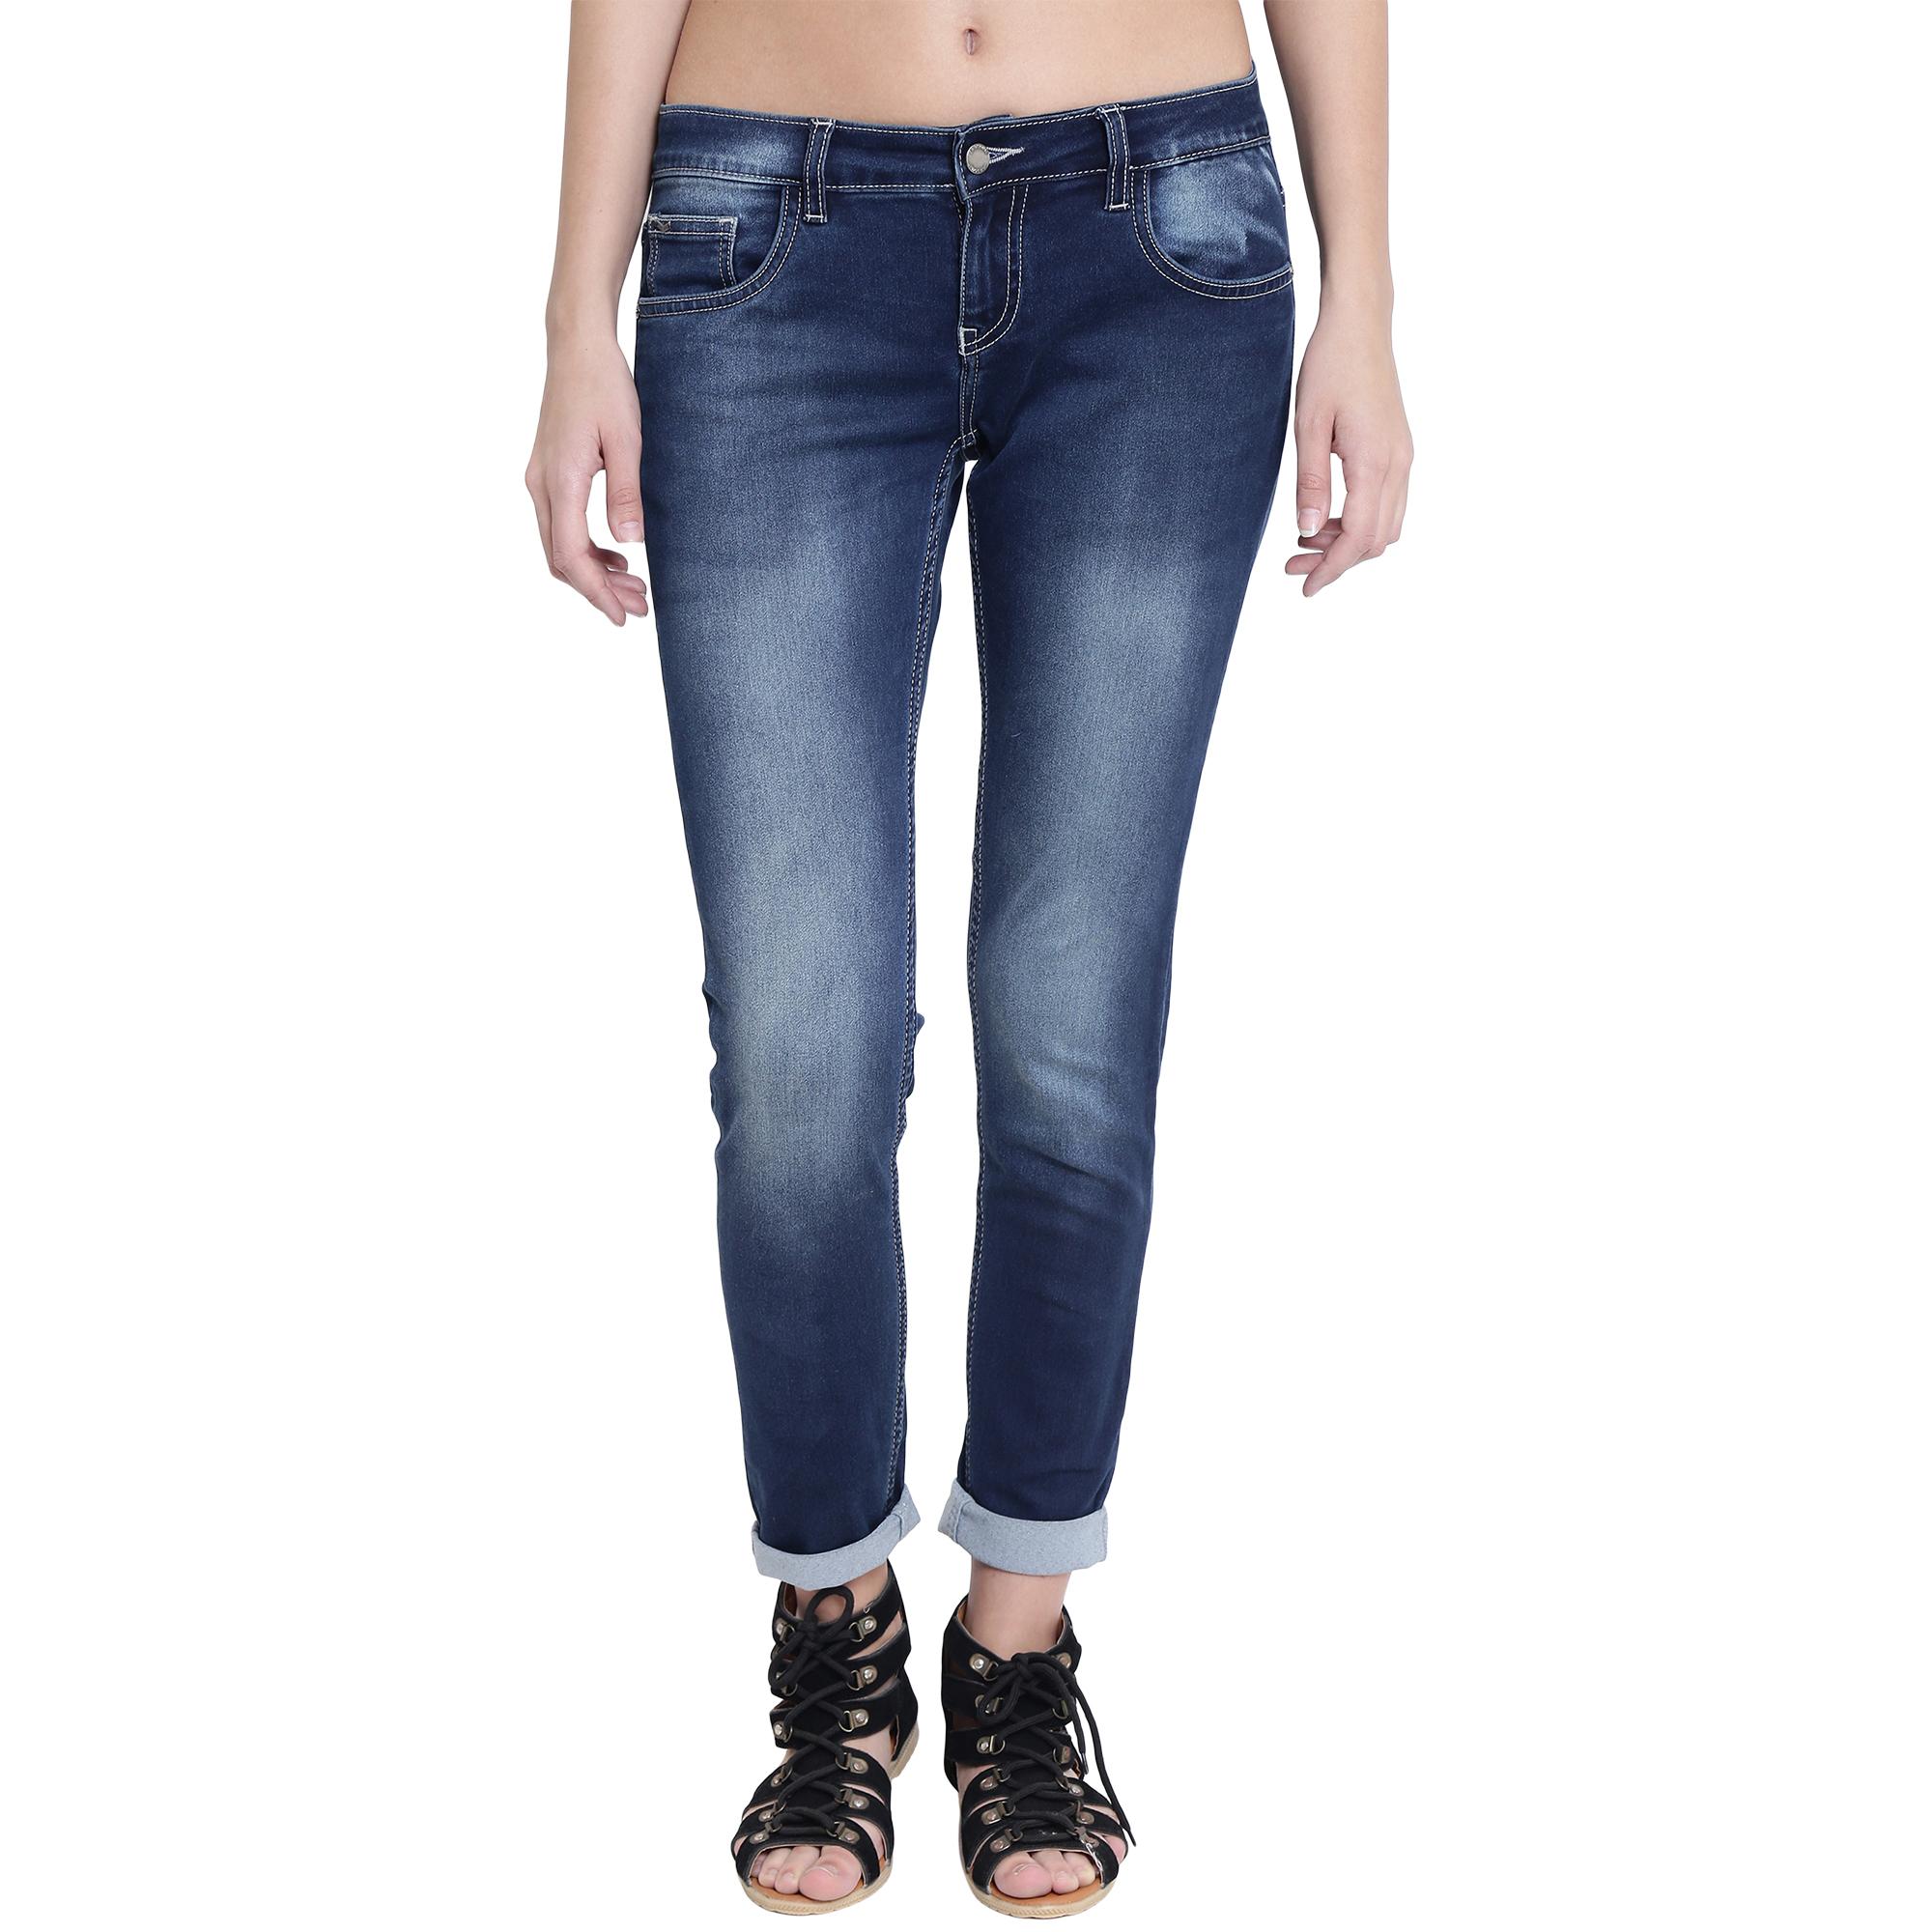 Crimsoune Club | Crimsoune Club Women's Blue Solid Jeans